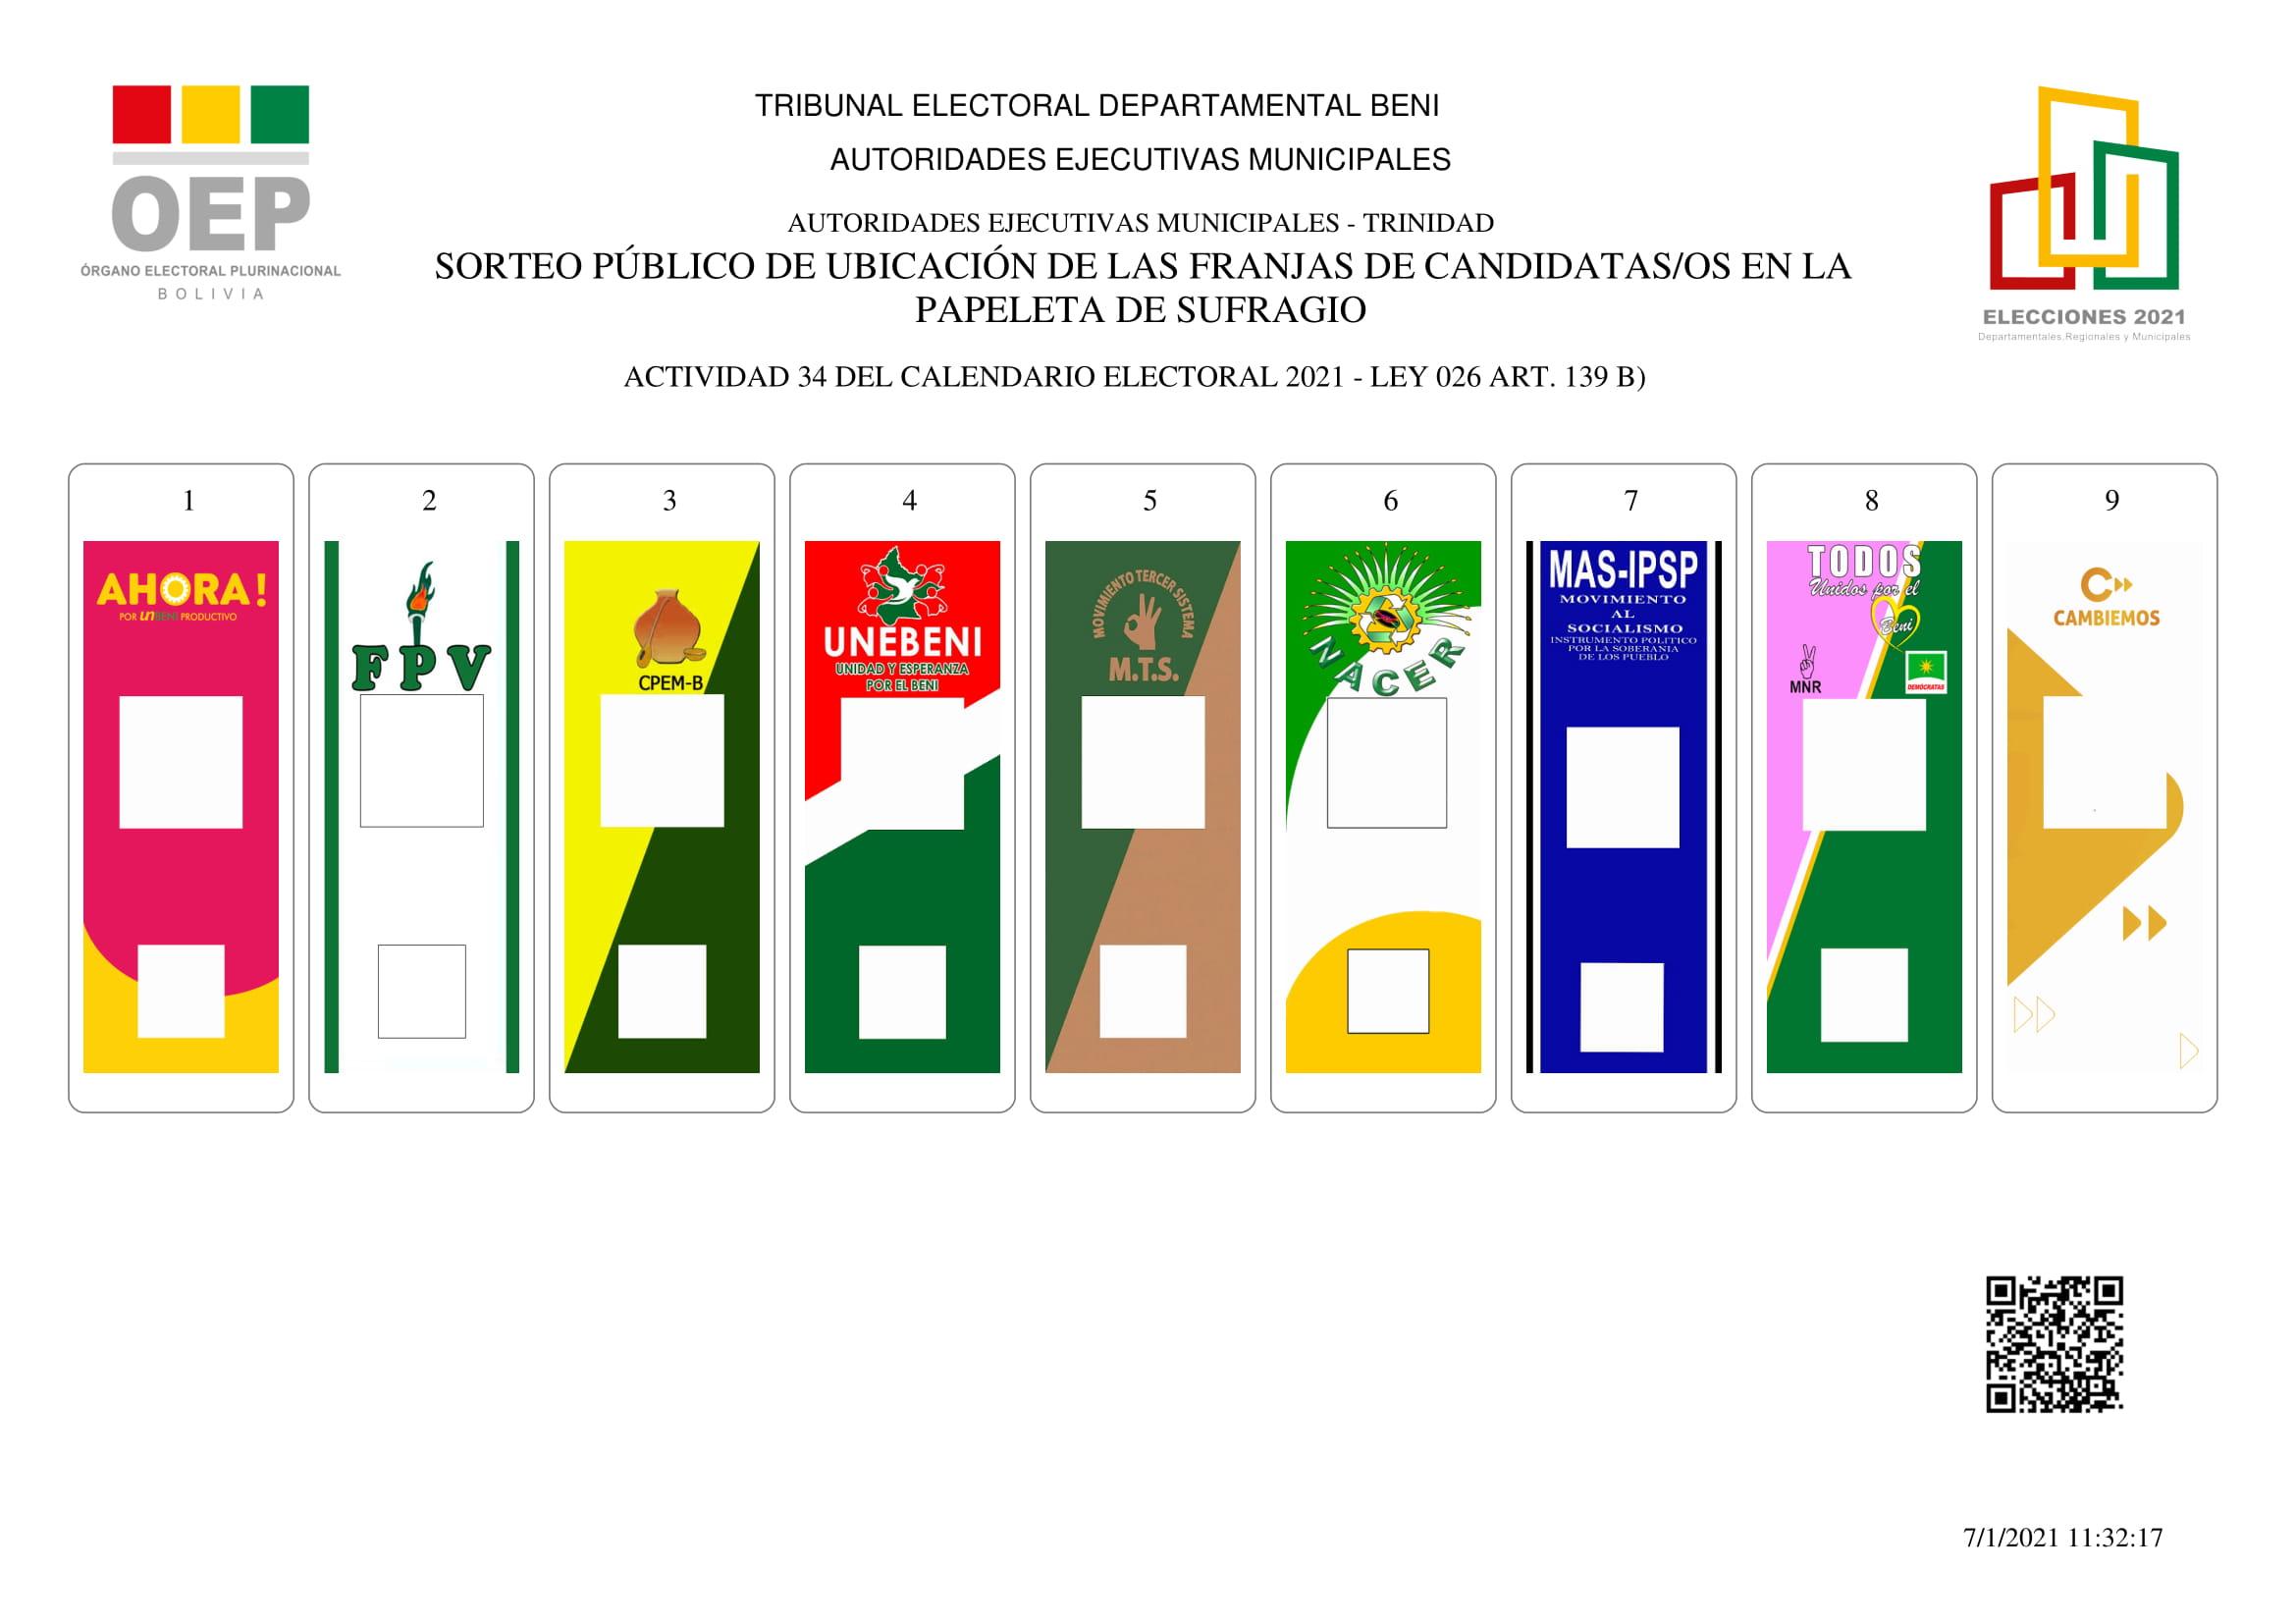 Municipal - Trinidad-1